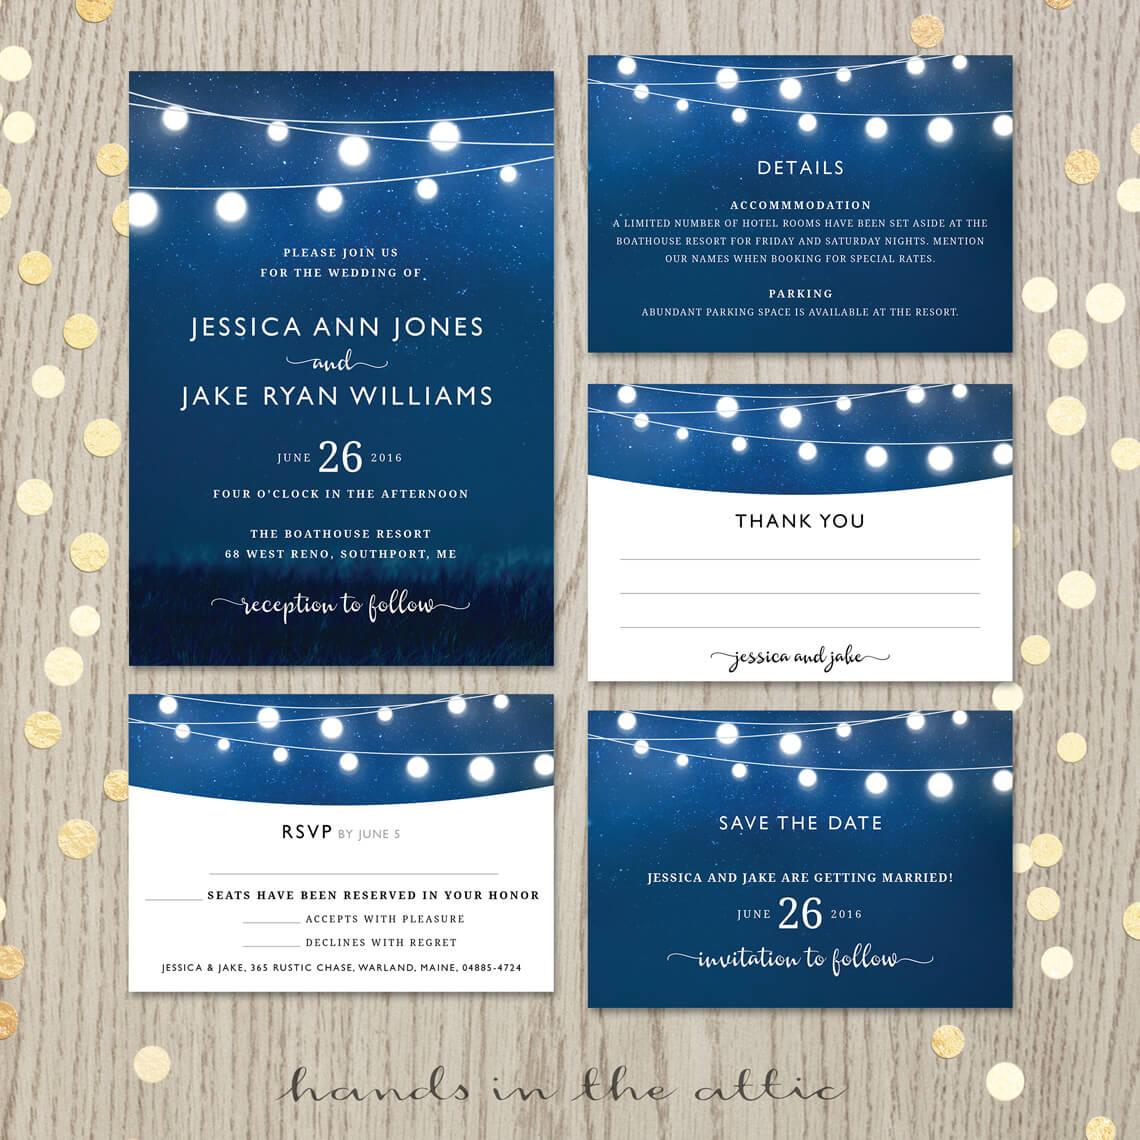 Royal Blue Wedding Invitation Set Hands In The Attic